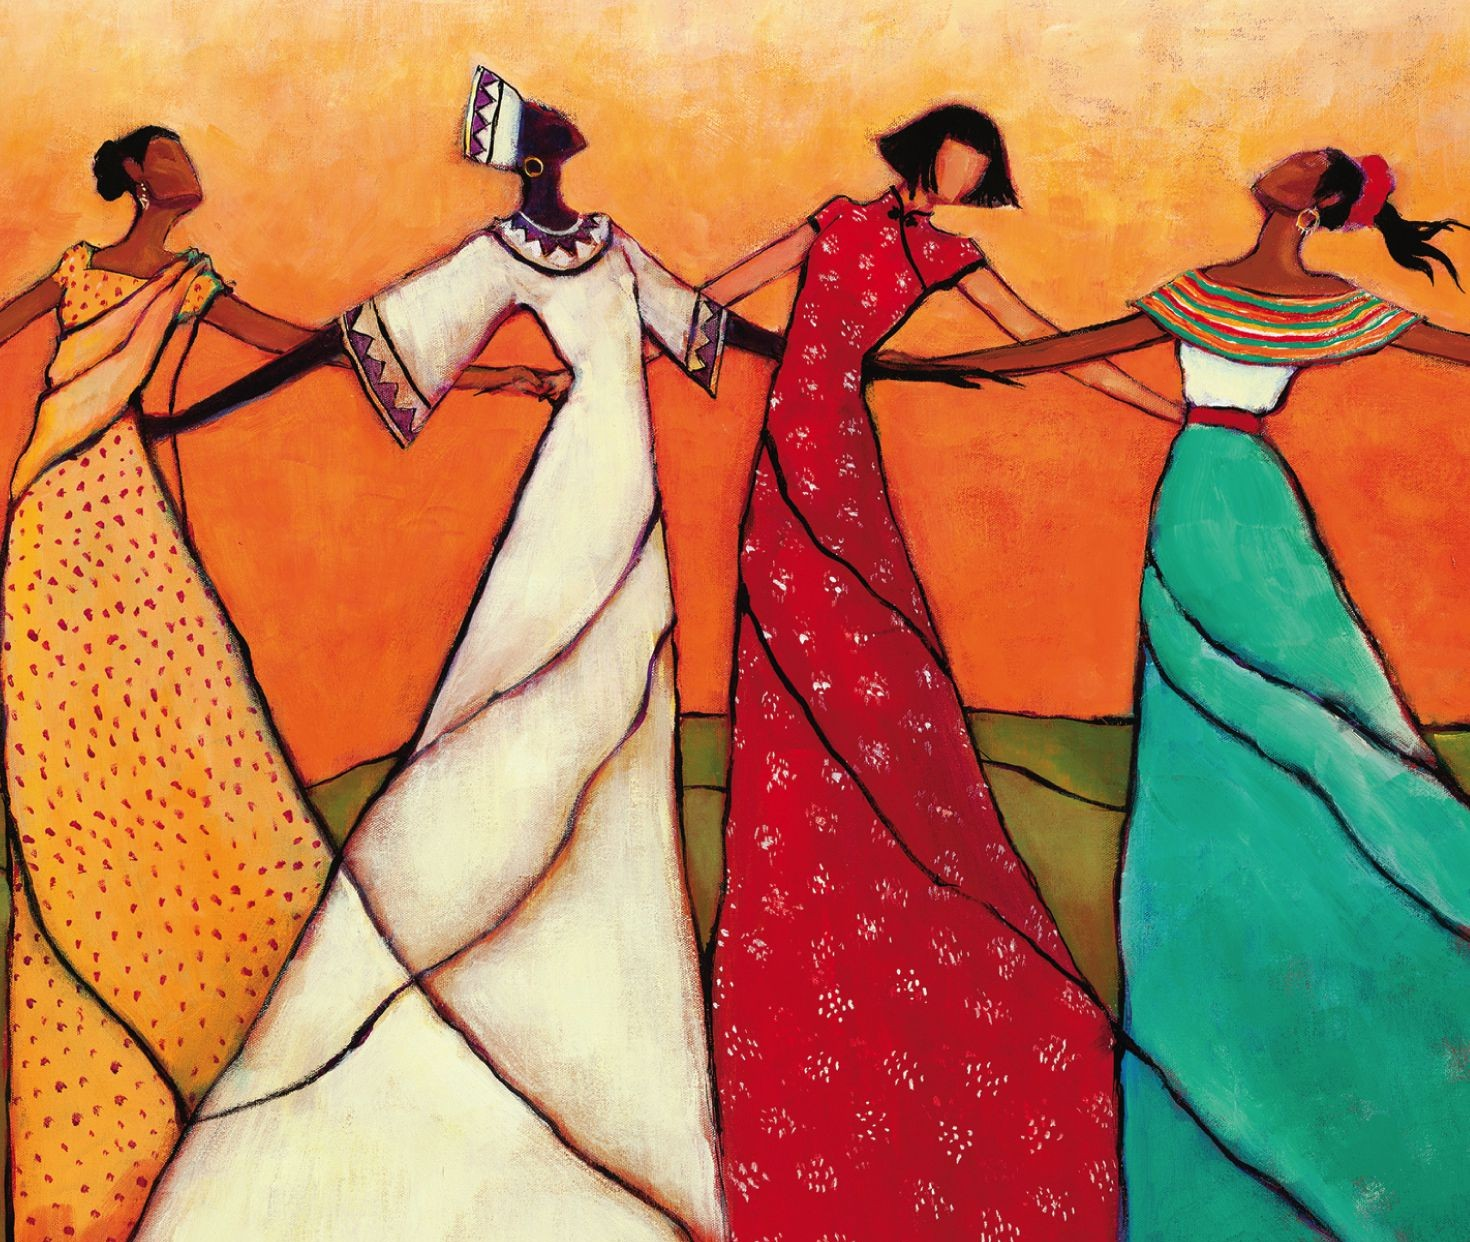 Strong Diverse Women Of The World - Feminist Manifesto (2)